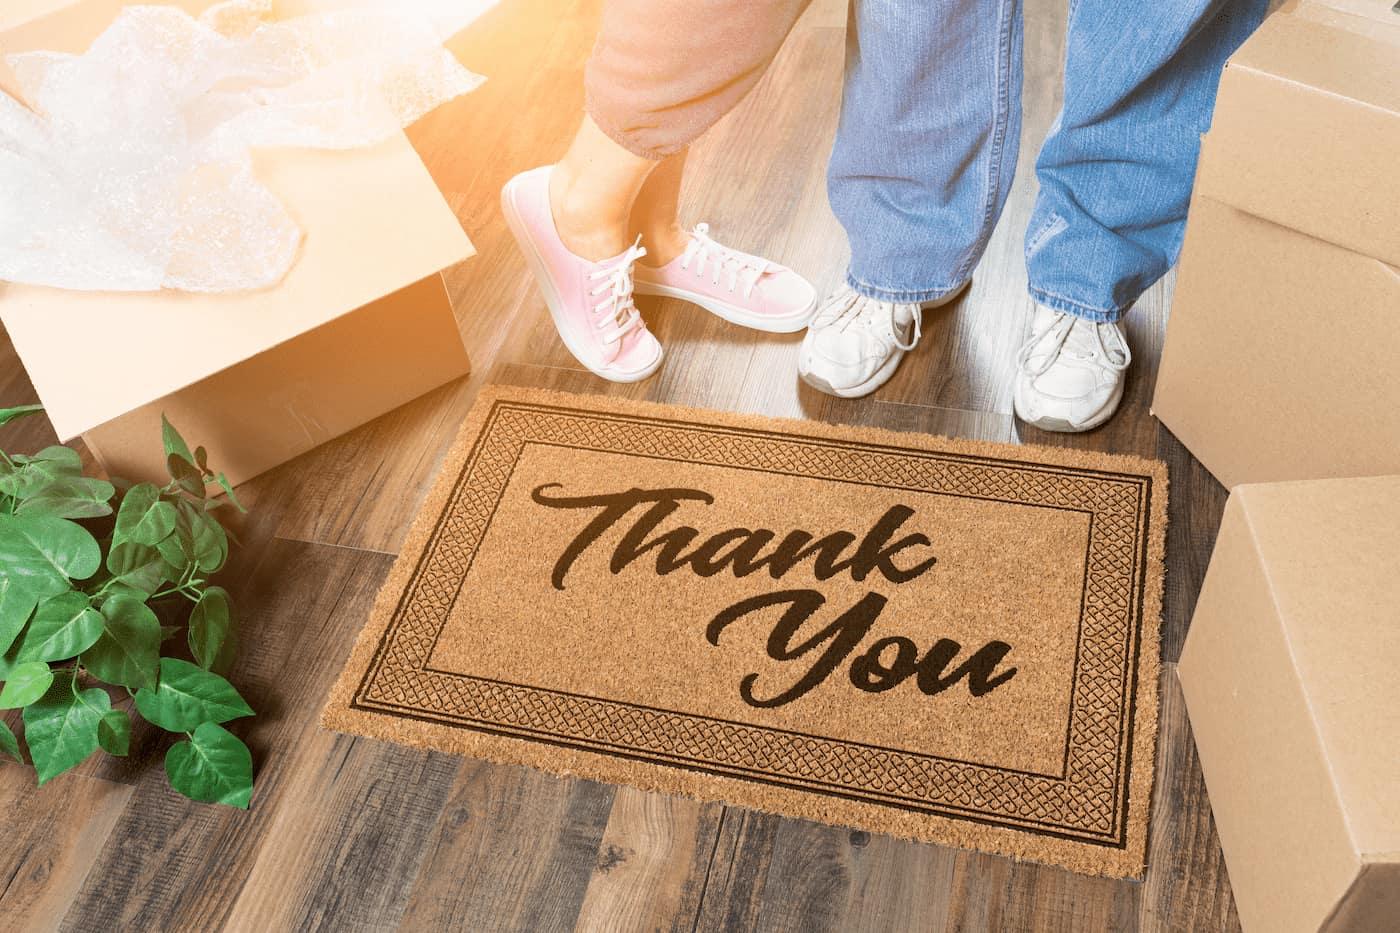 Appreciating tenants can increase lease renewals